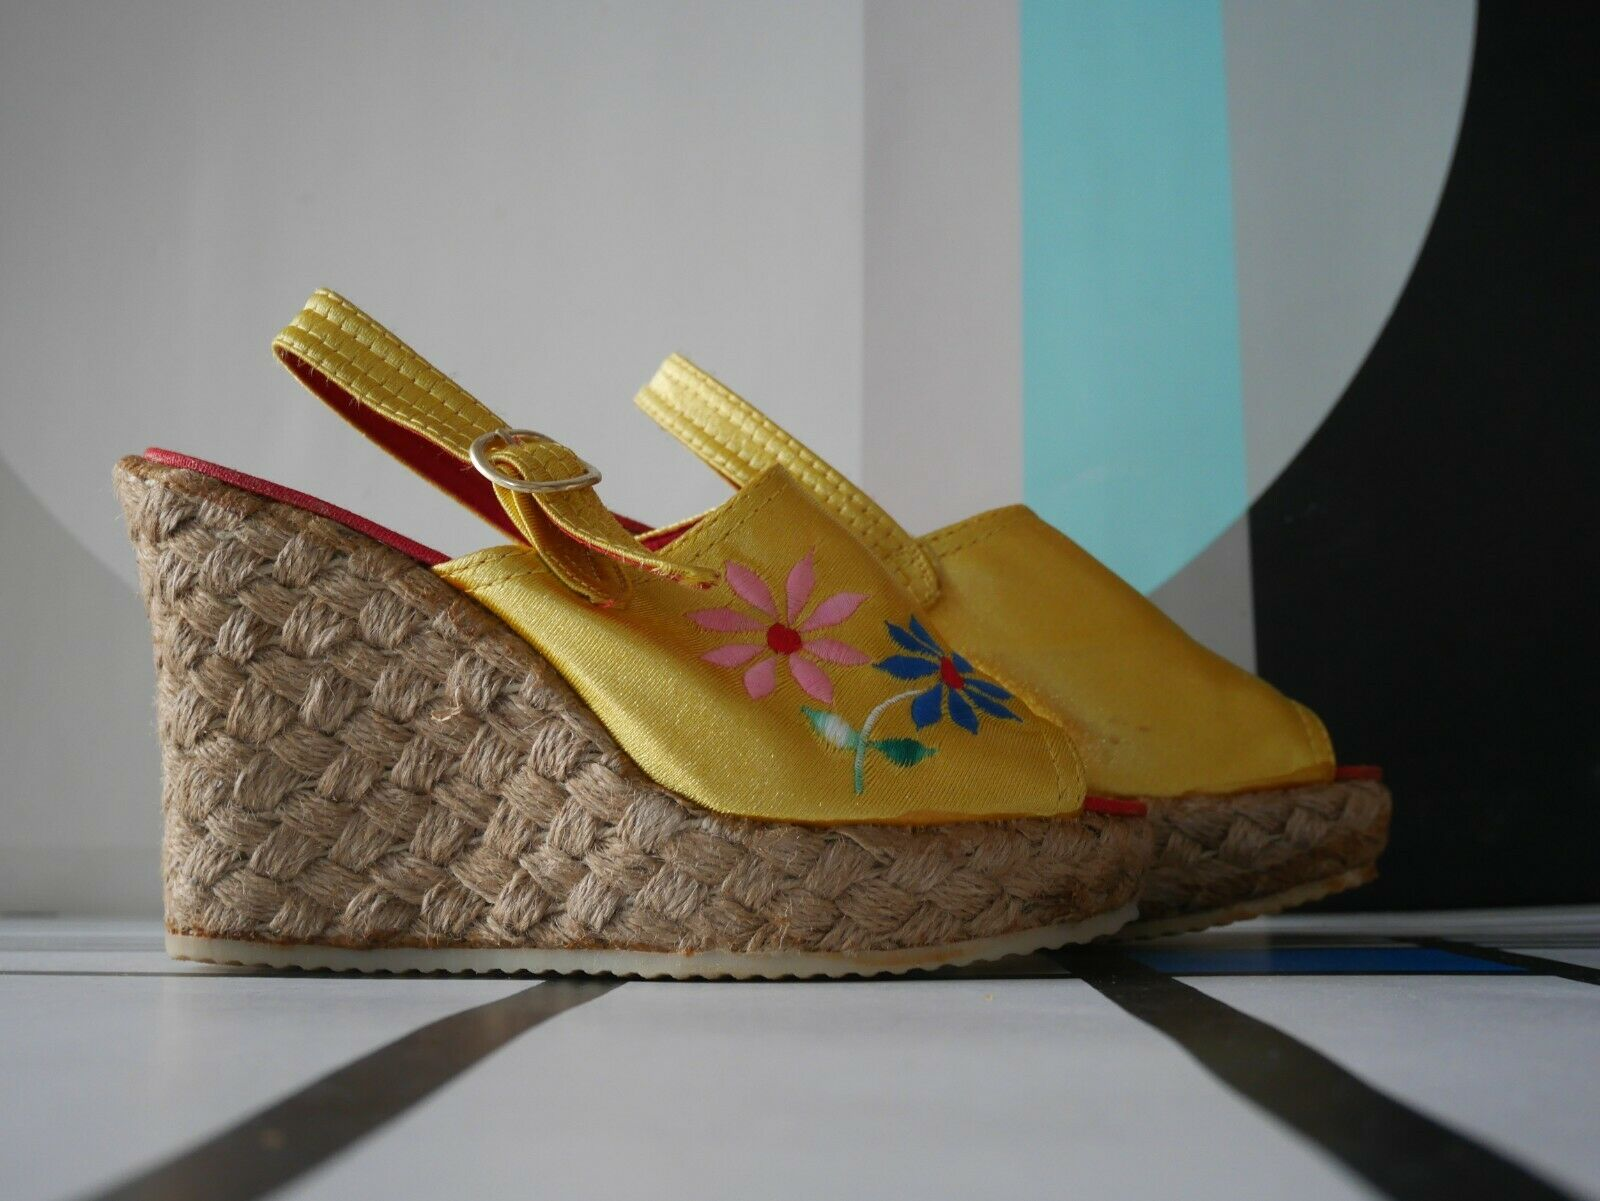 Bast-Sandale Keilabsatz 70er Flower Power Boho 37 Hippie TRUE VINTAGE wedges 70s